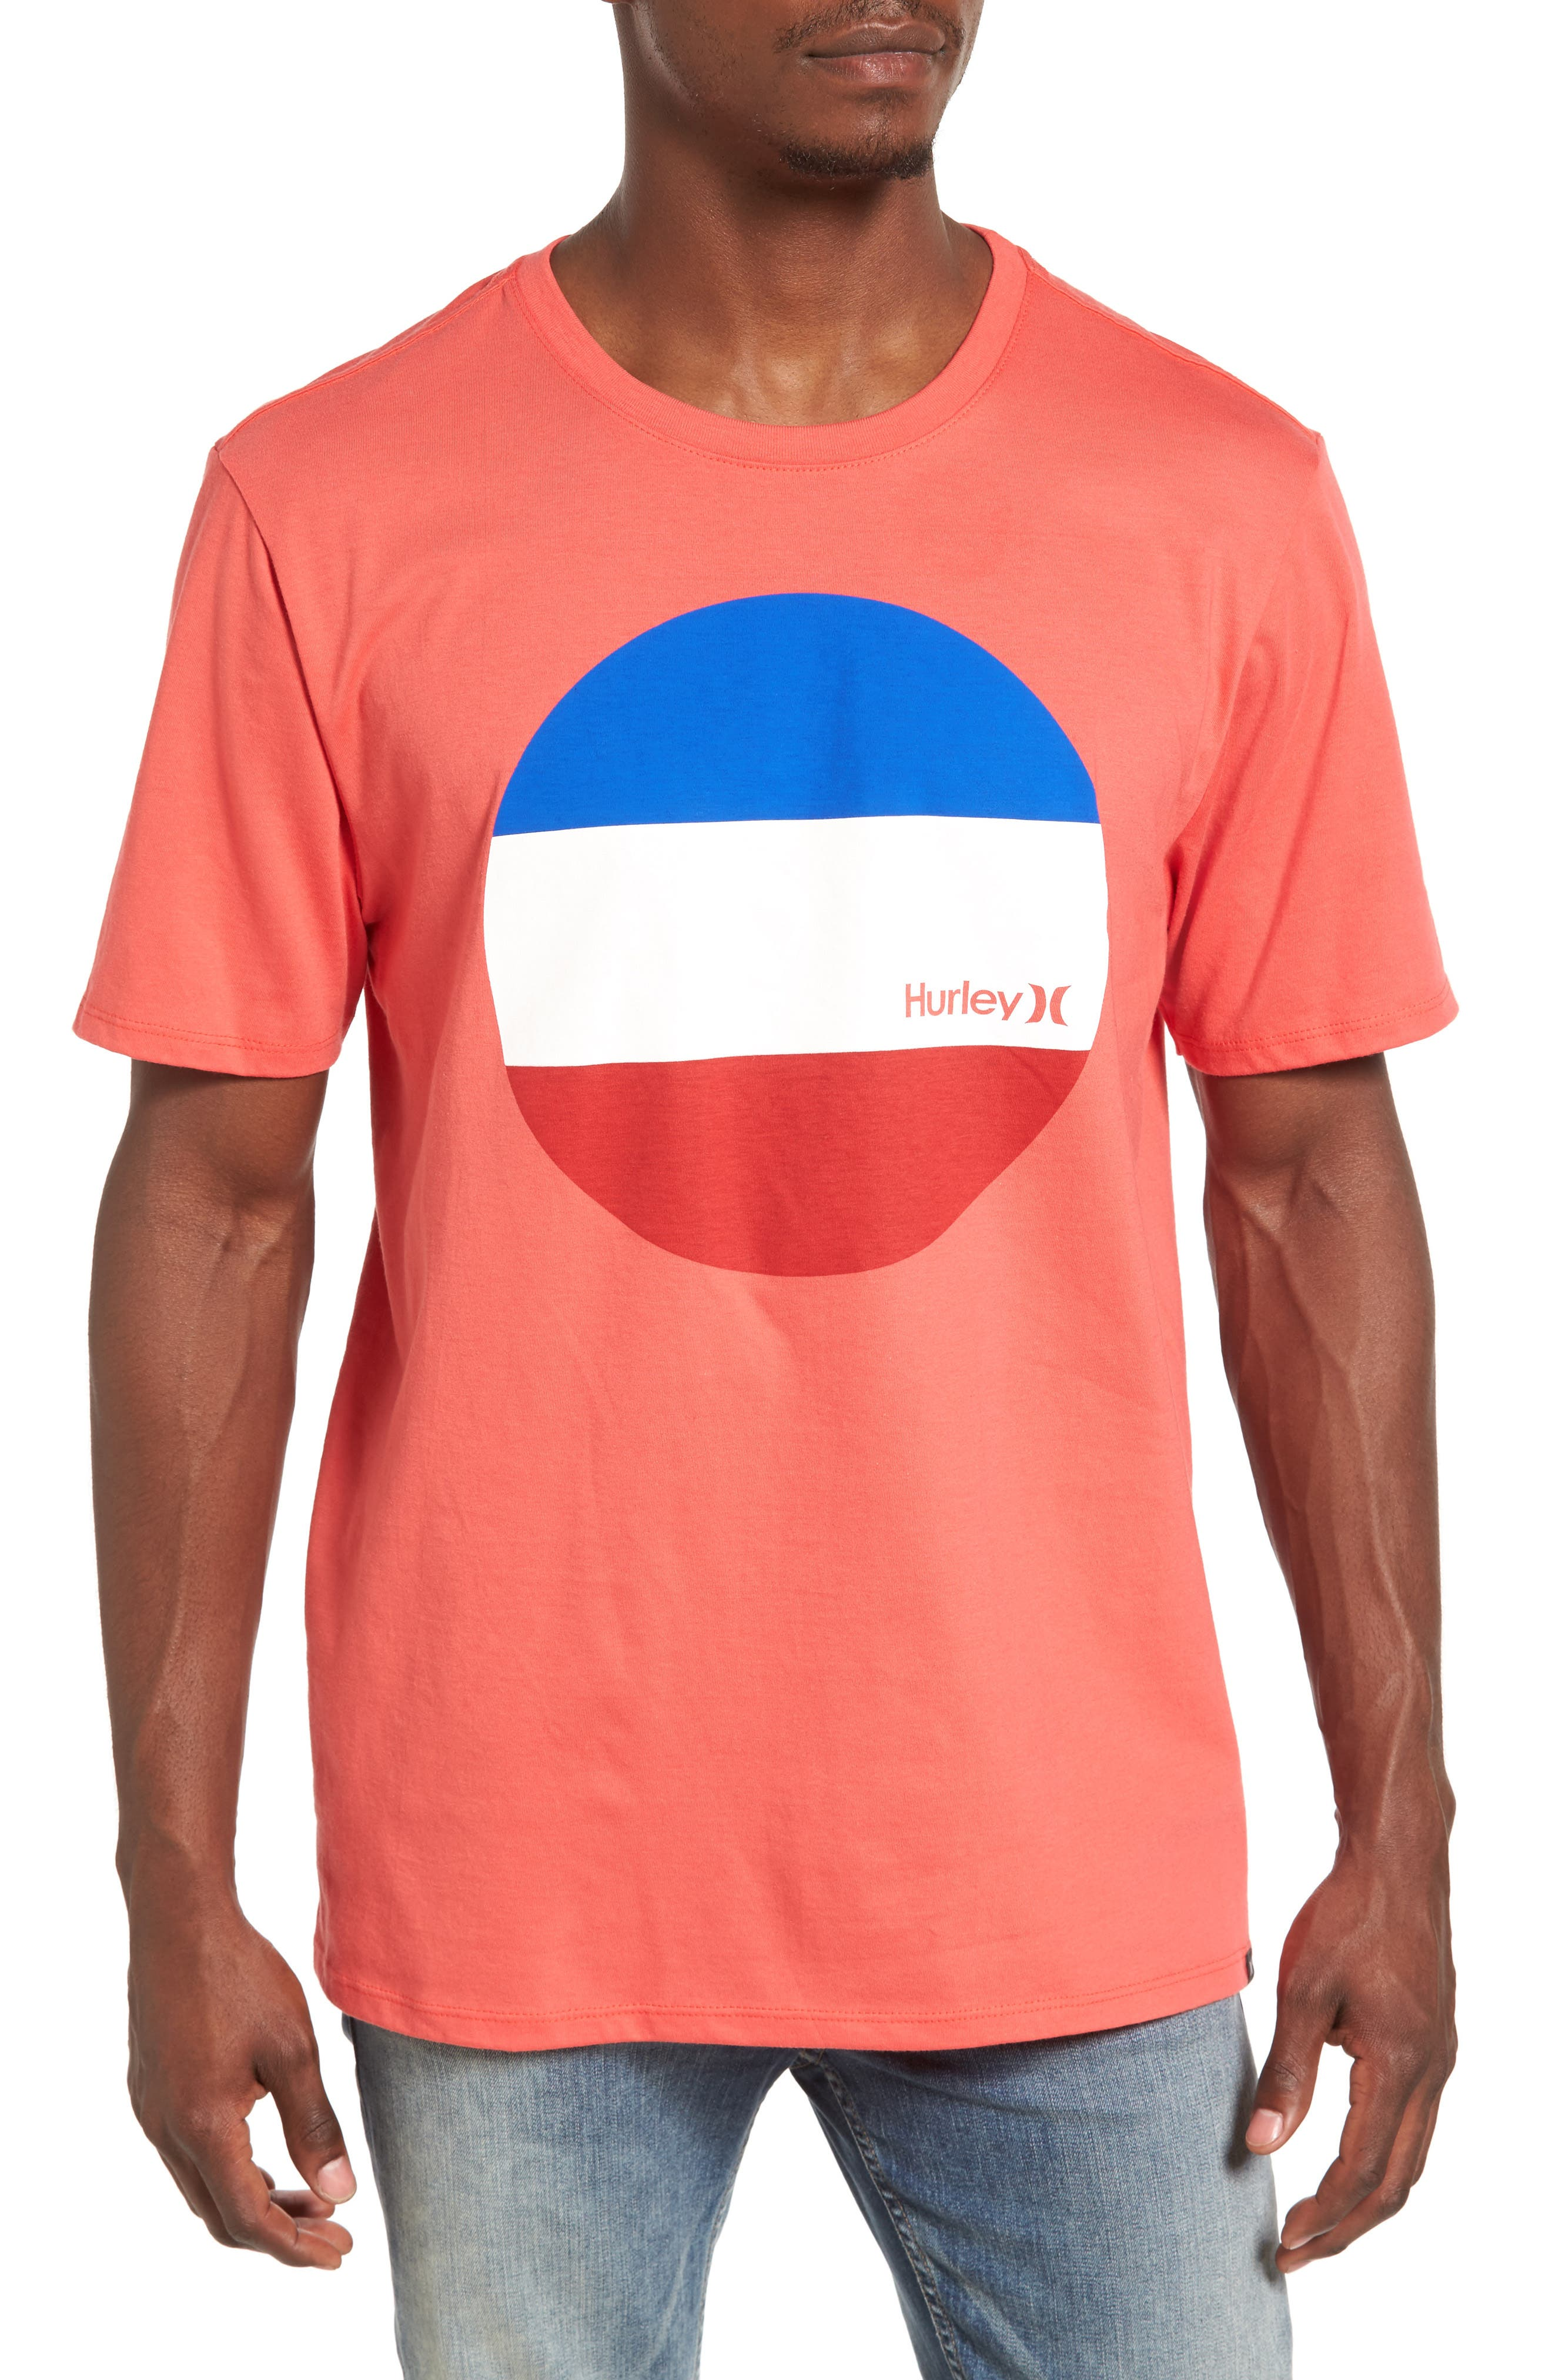 Hurley Circular Block Graphic T-Shirt